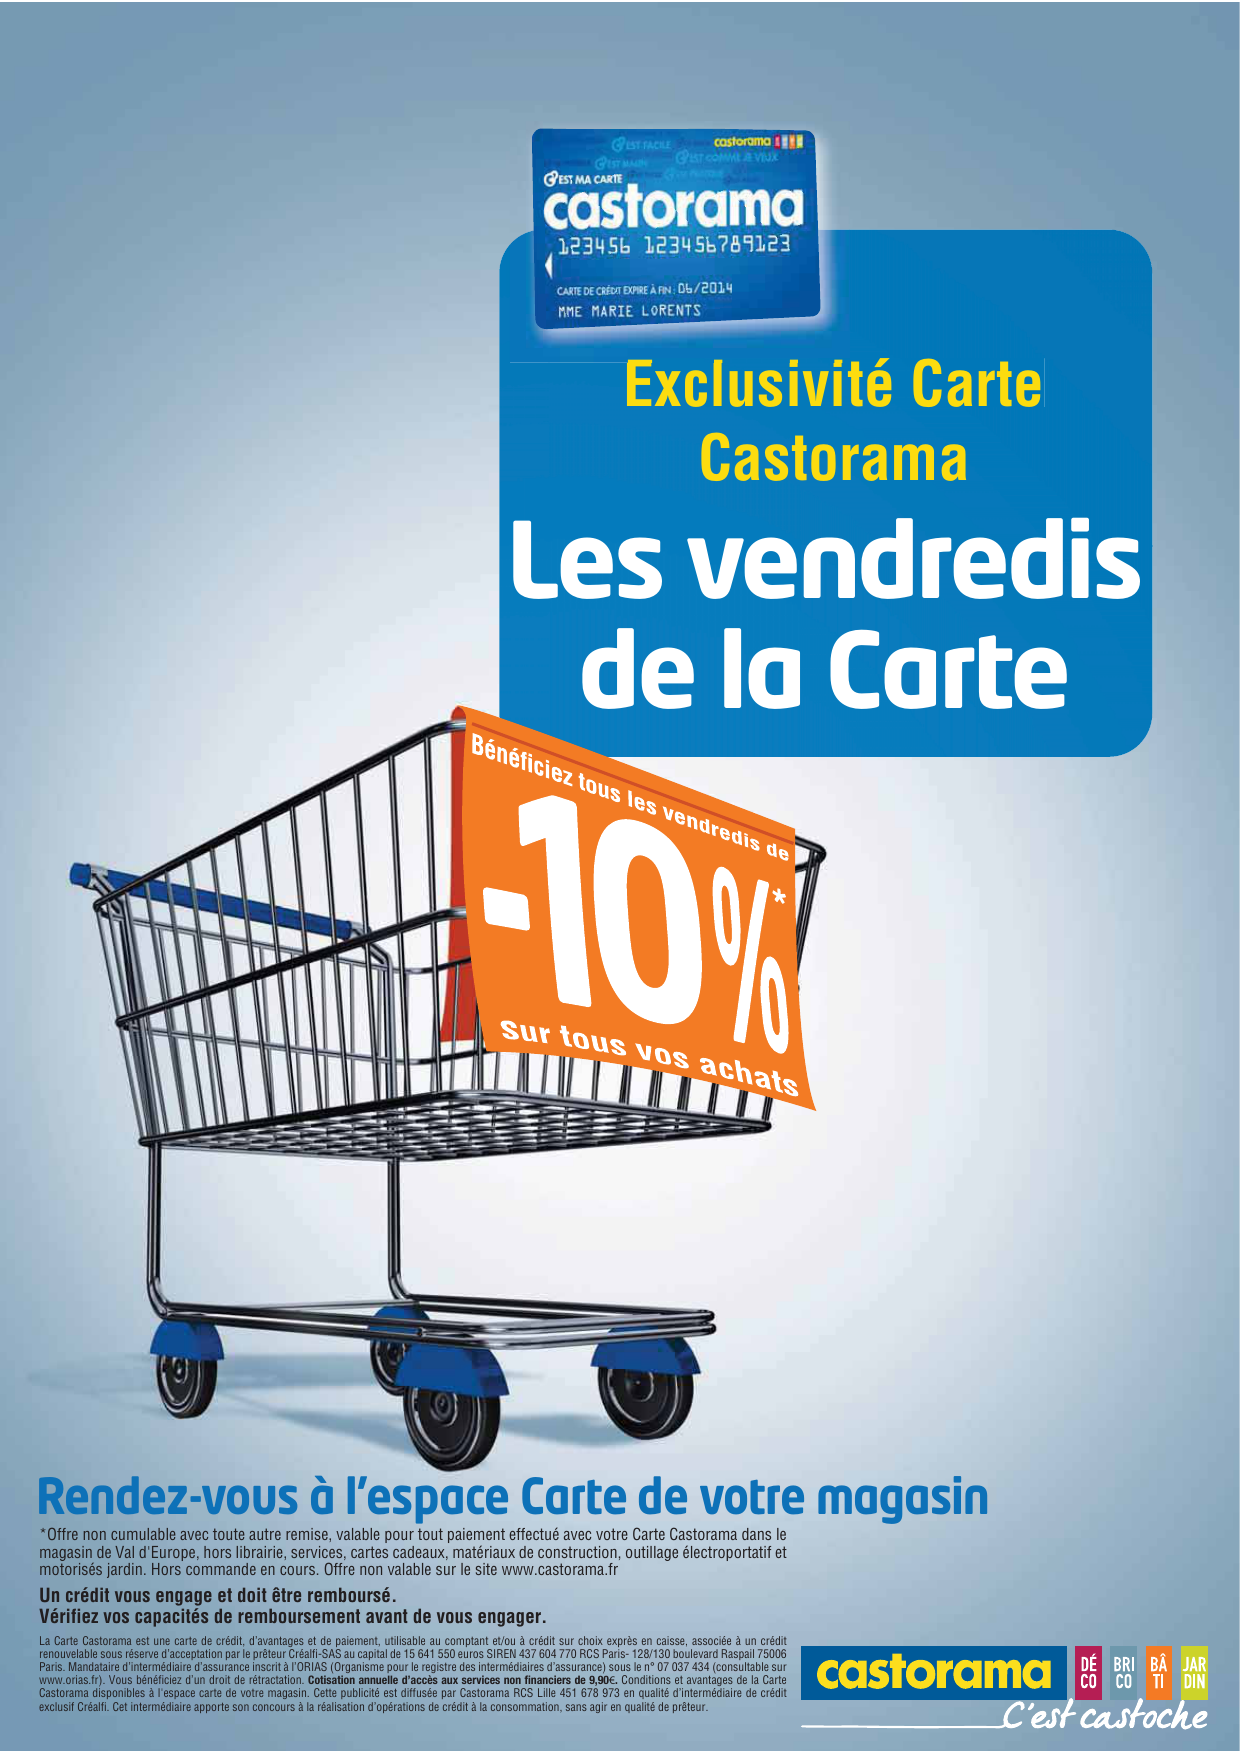 Castorama Carte Des Magasins.Les Vendredis De La Carte